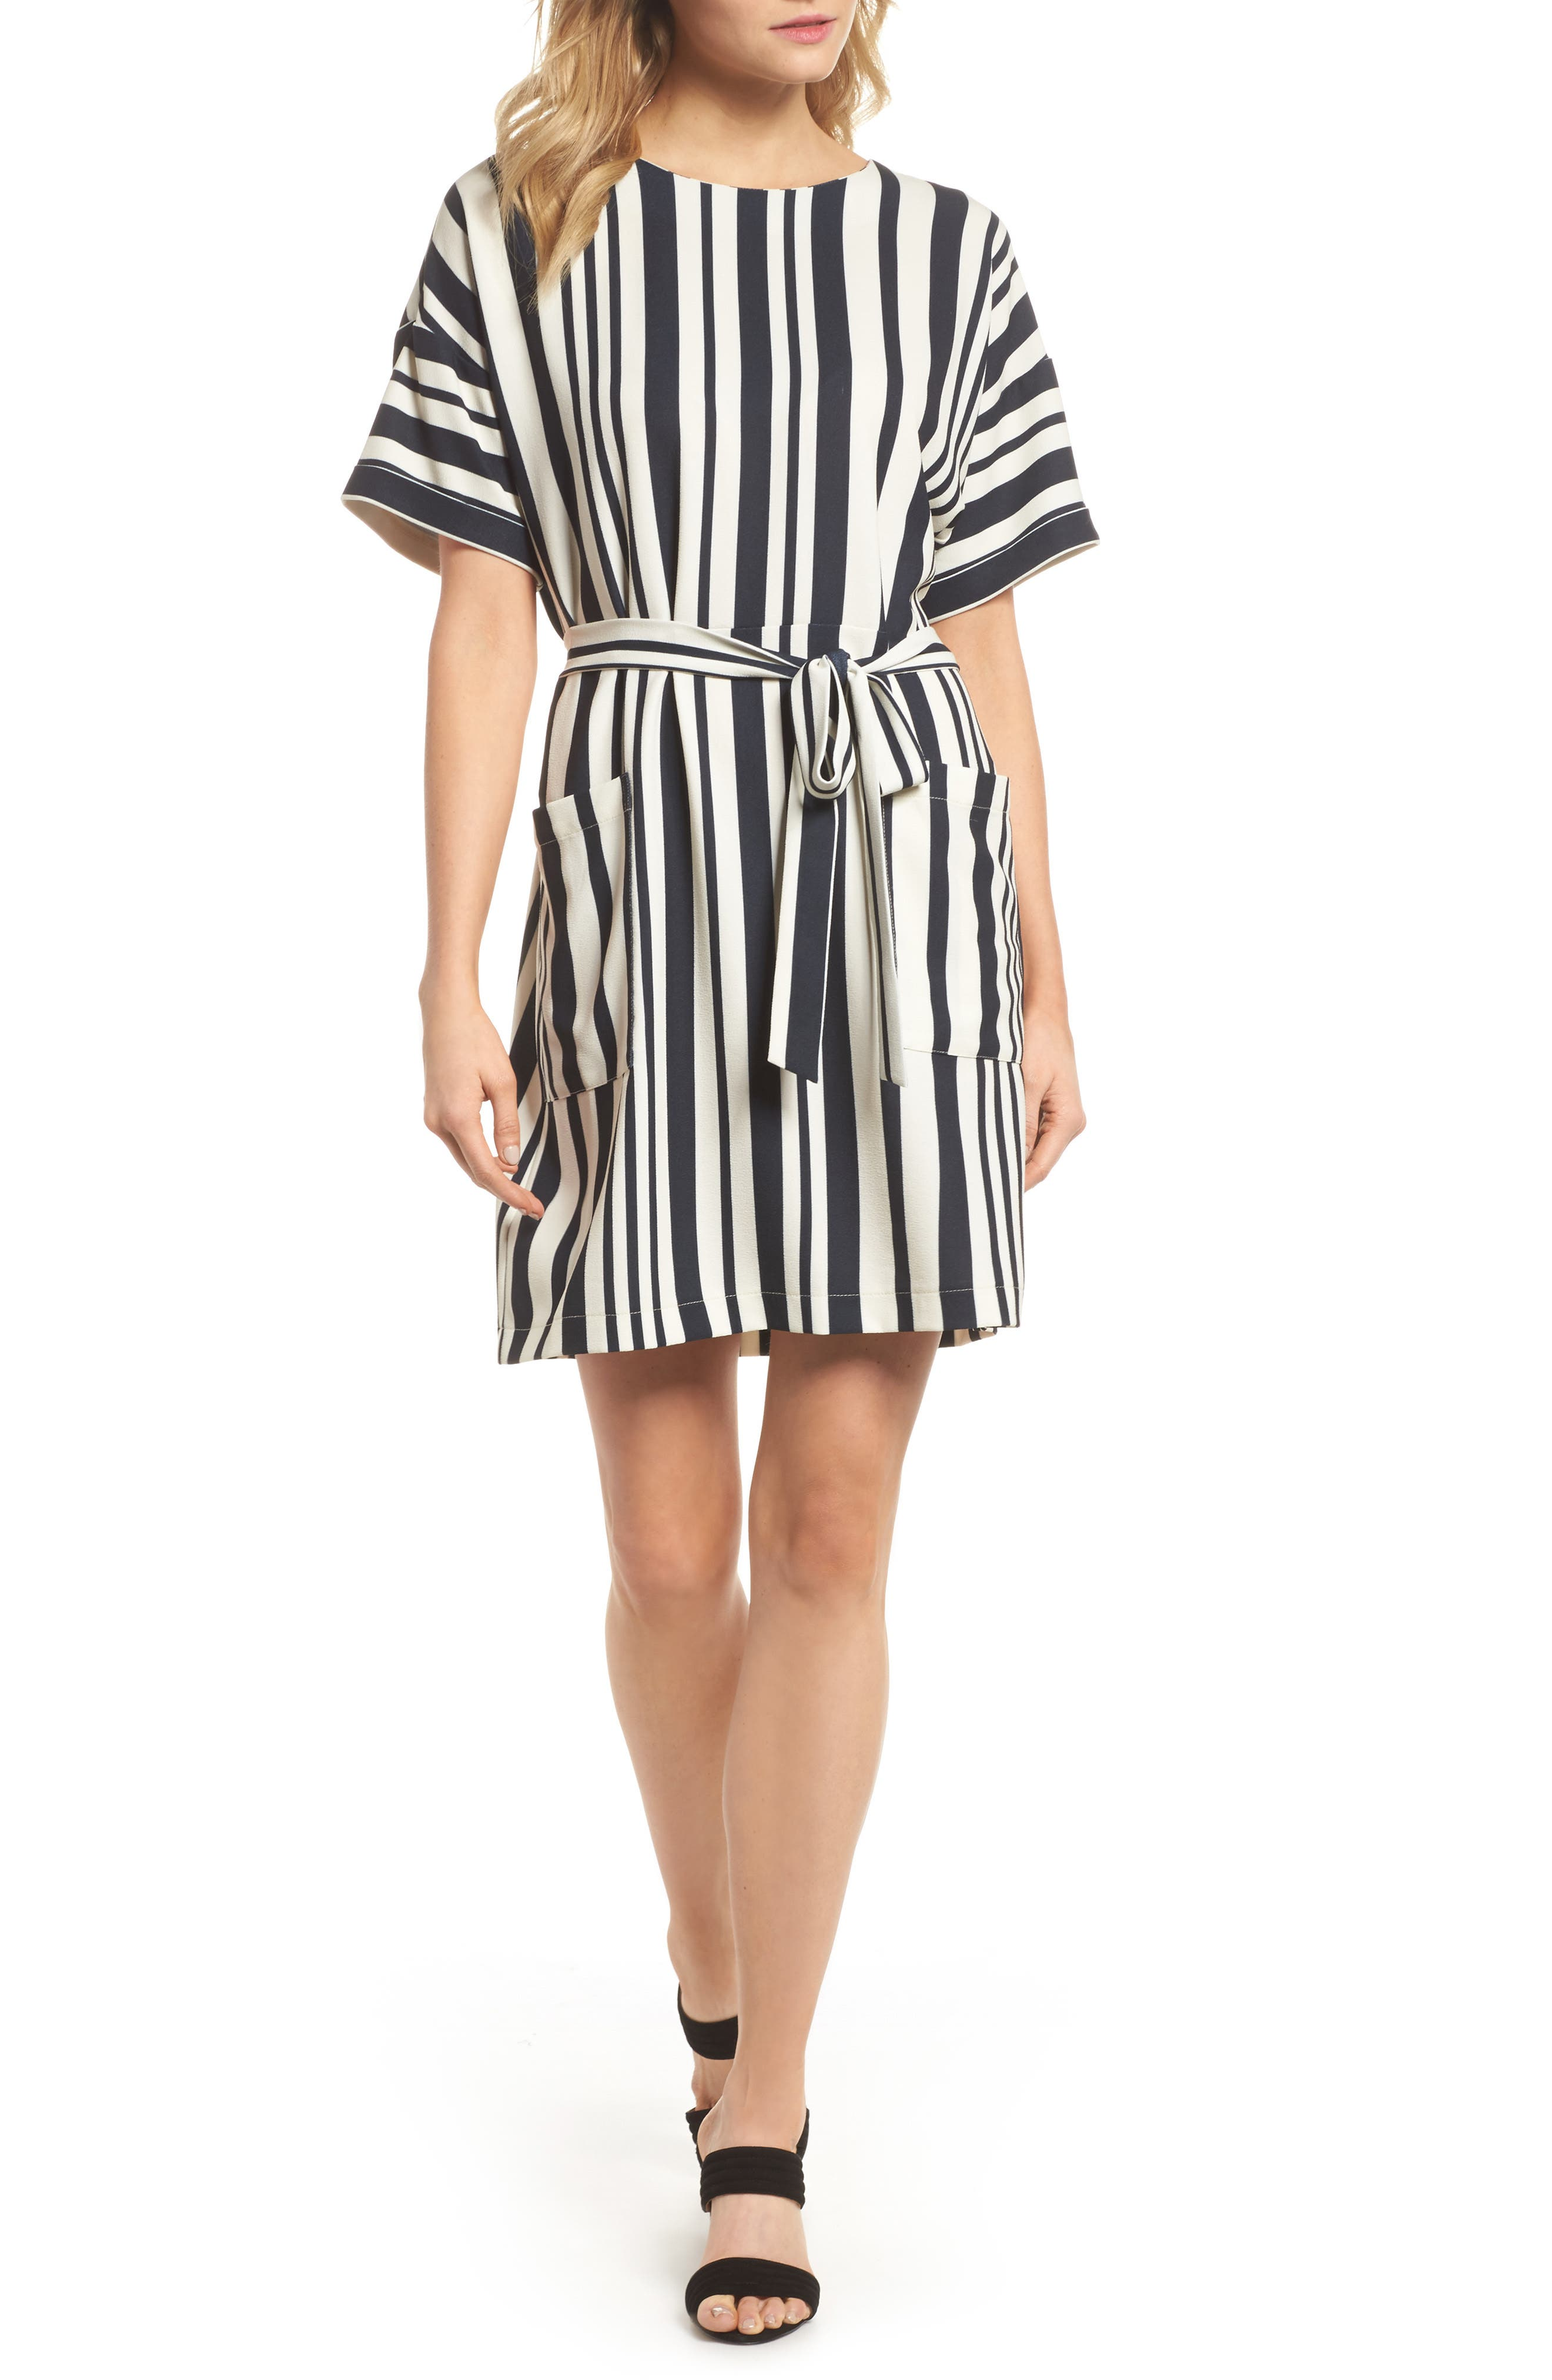 Felicity & Coco Sterling Stripe Dress